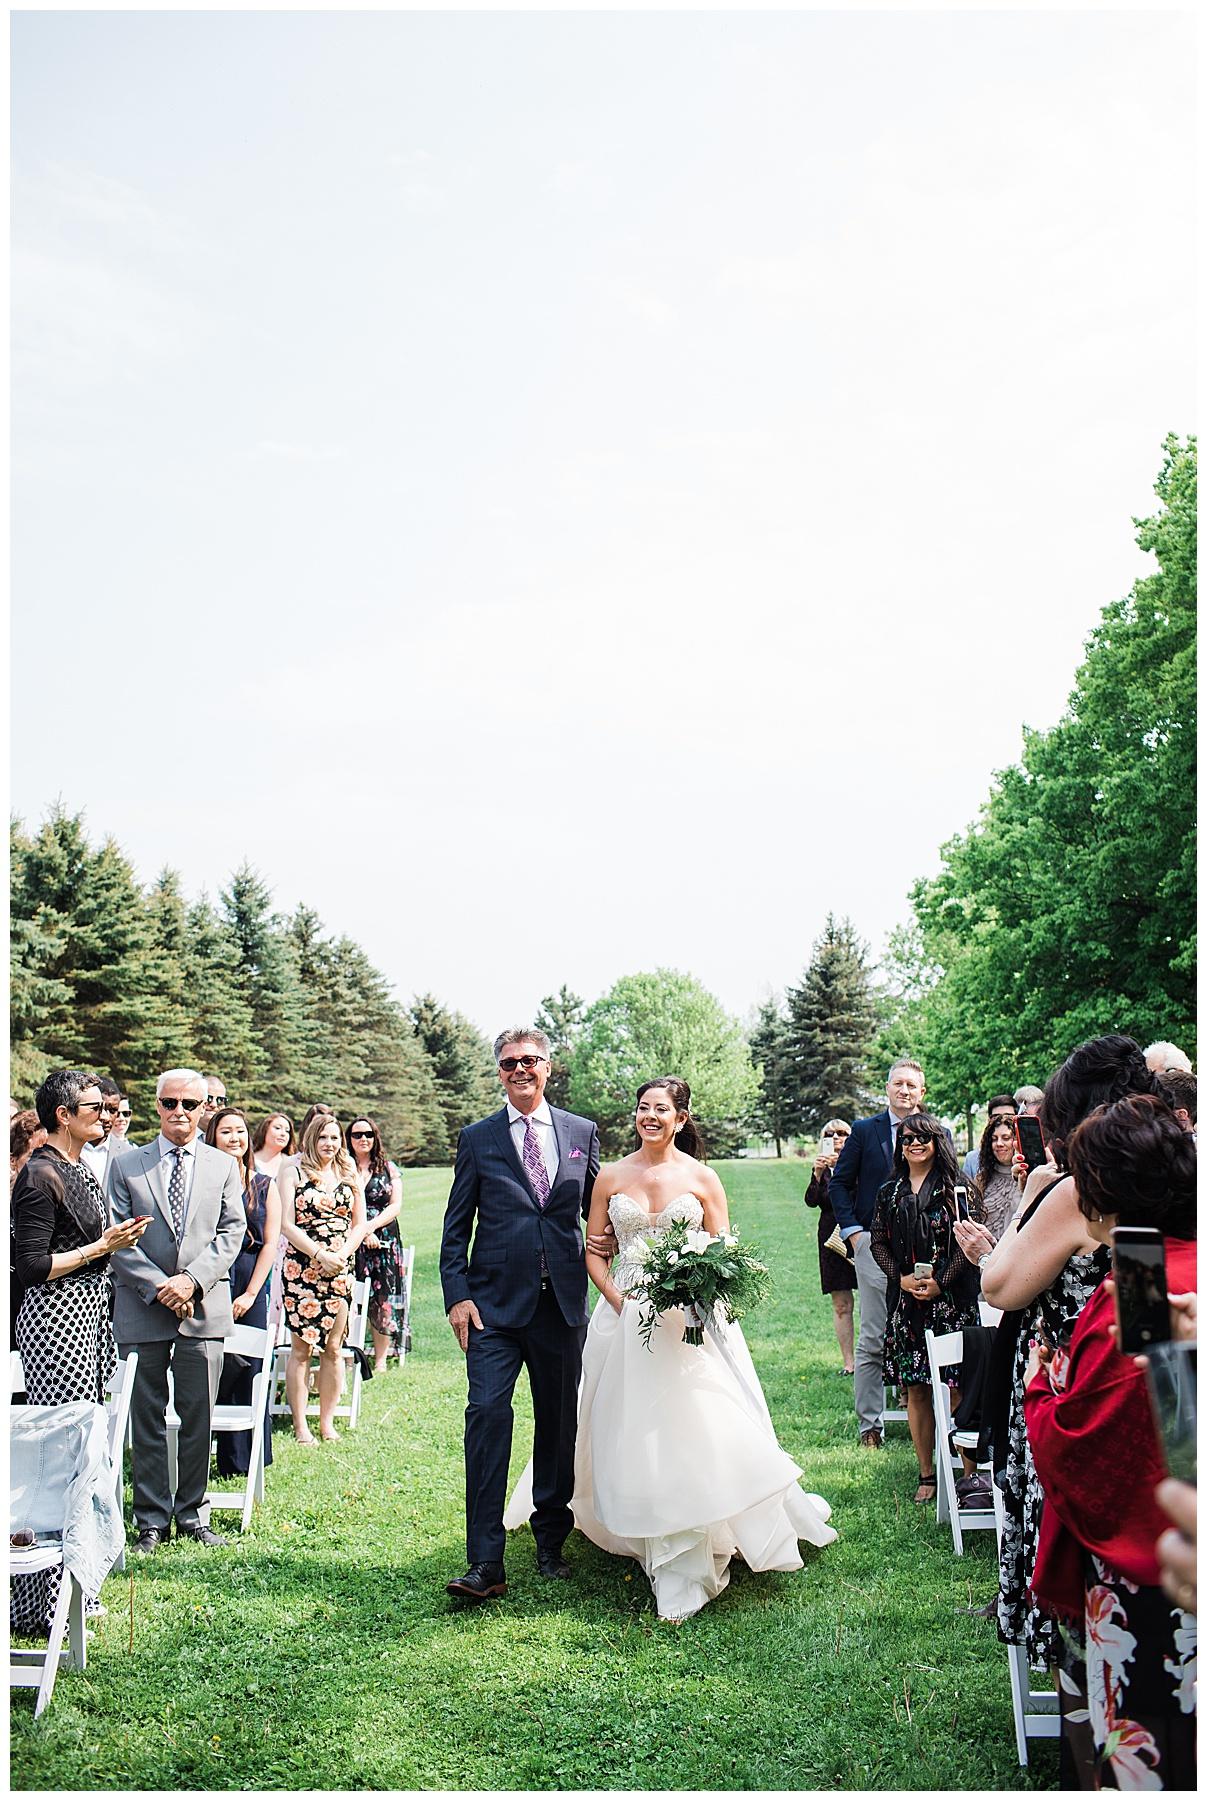 Bride walks down aisle with father| outdoor tree-farm ceremony| Belcroft Estate Wedding| Toronto wedding photographer| Ontario wedding photographer| 3photography